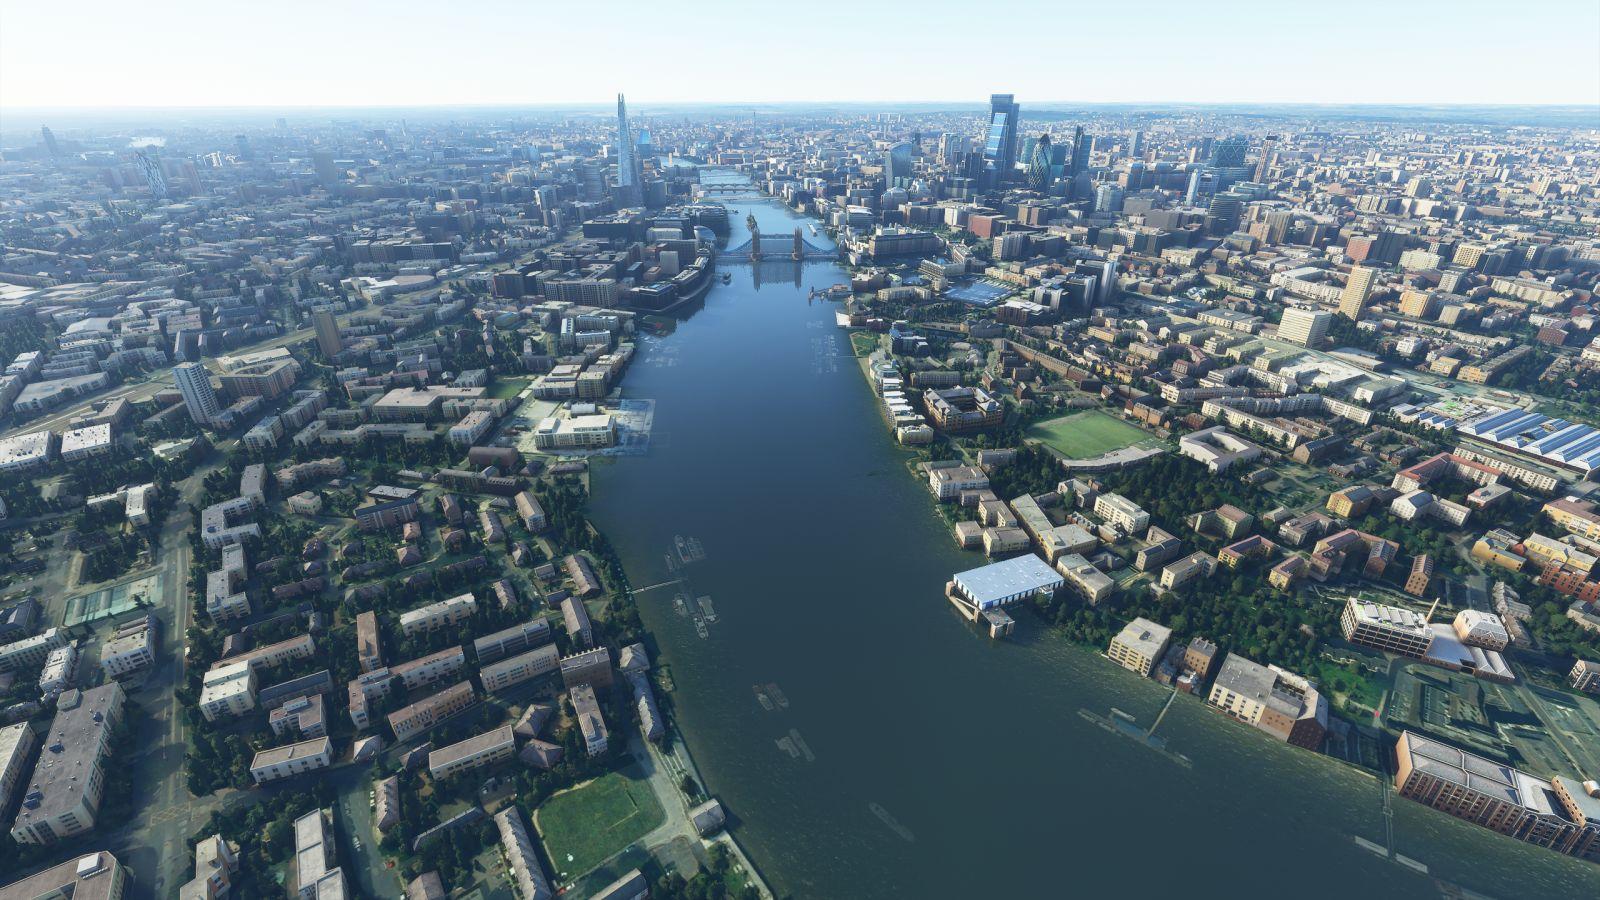 MSFS_LondonCity_056